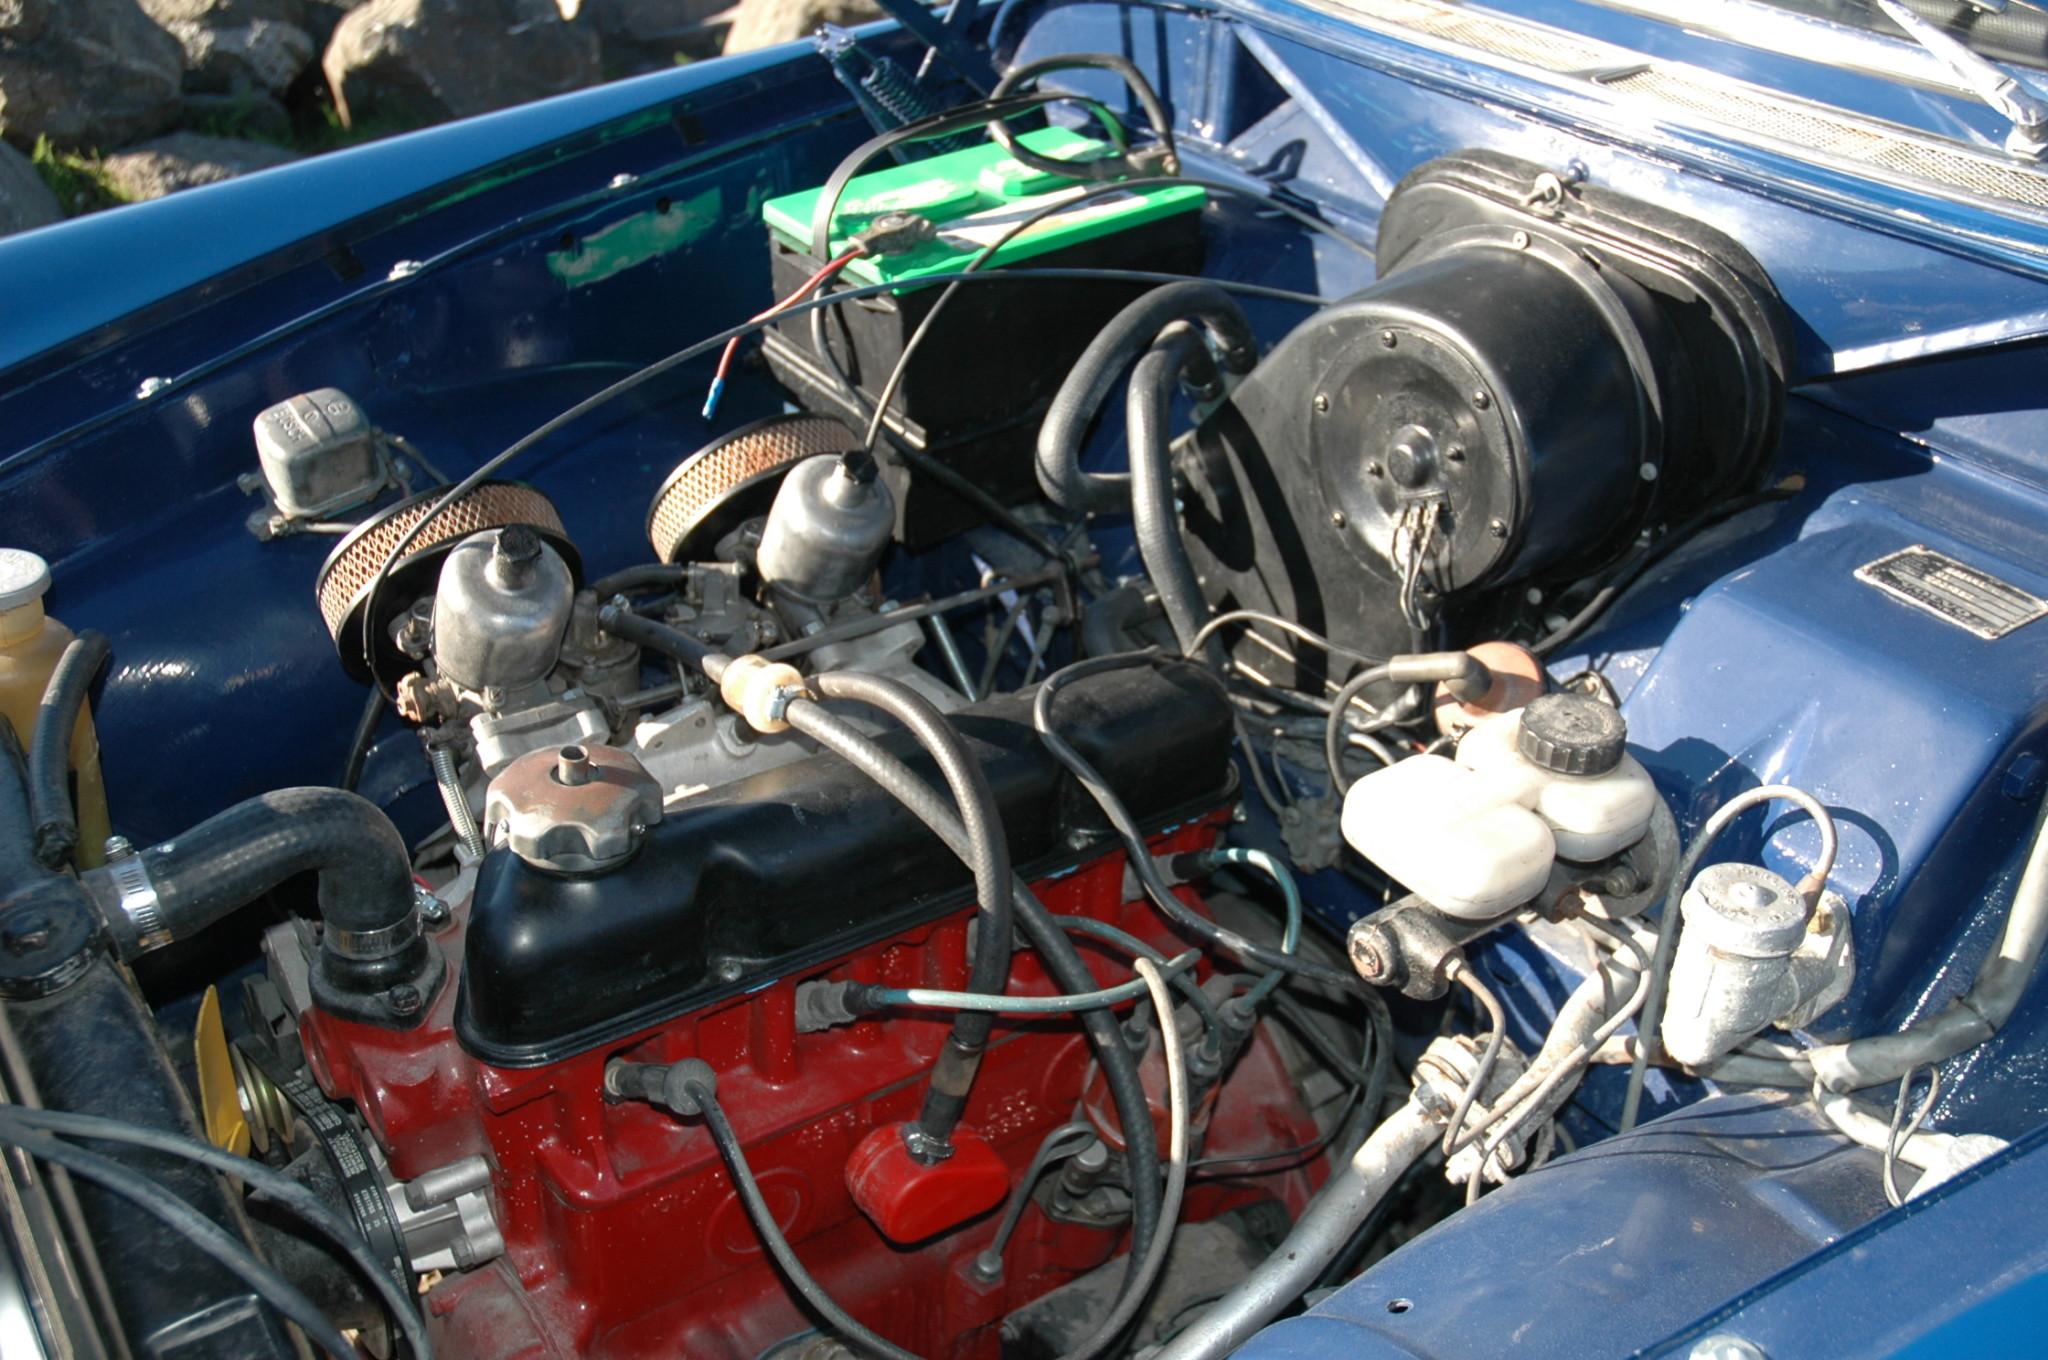 1967 Volvo 122S Wagon engine